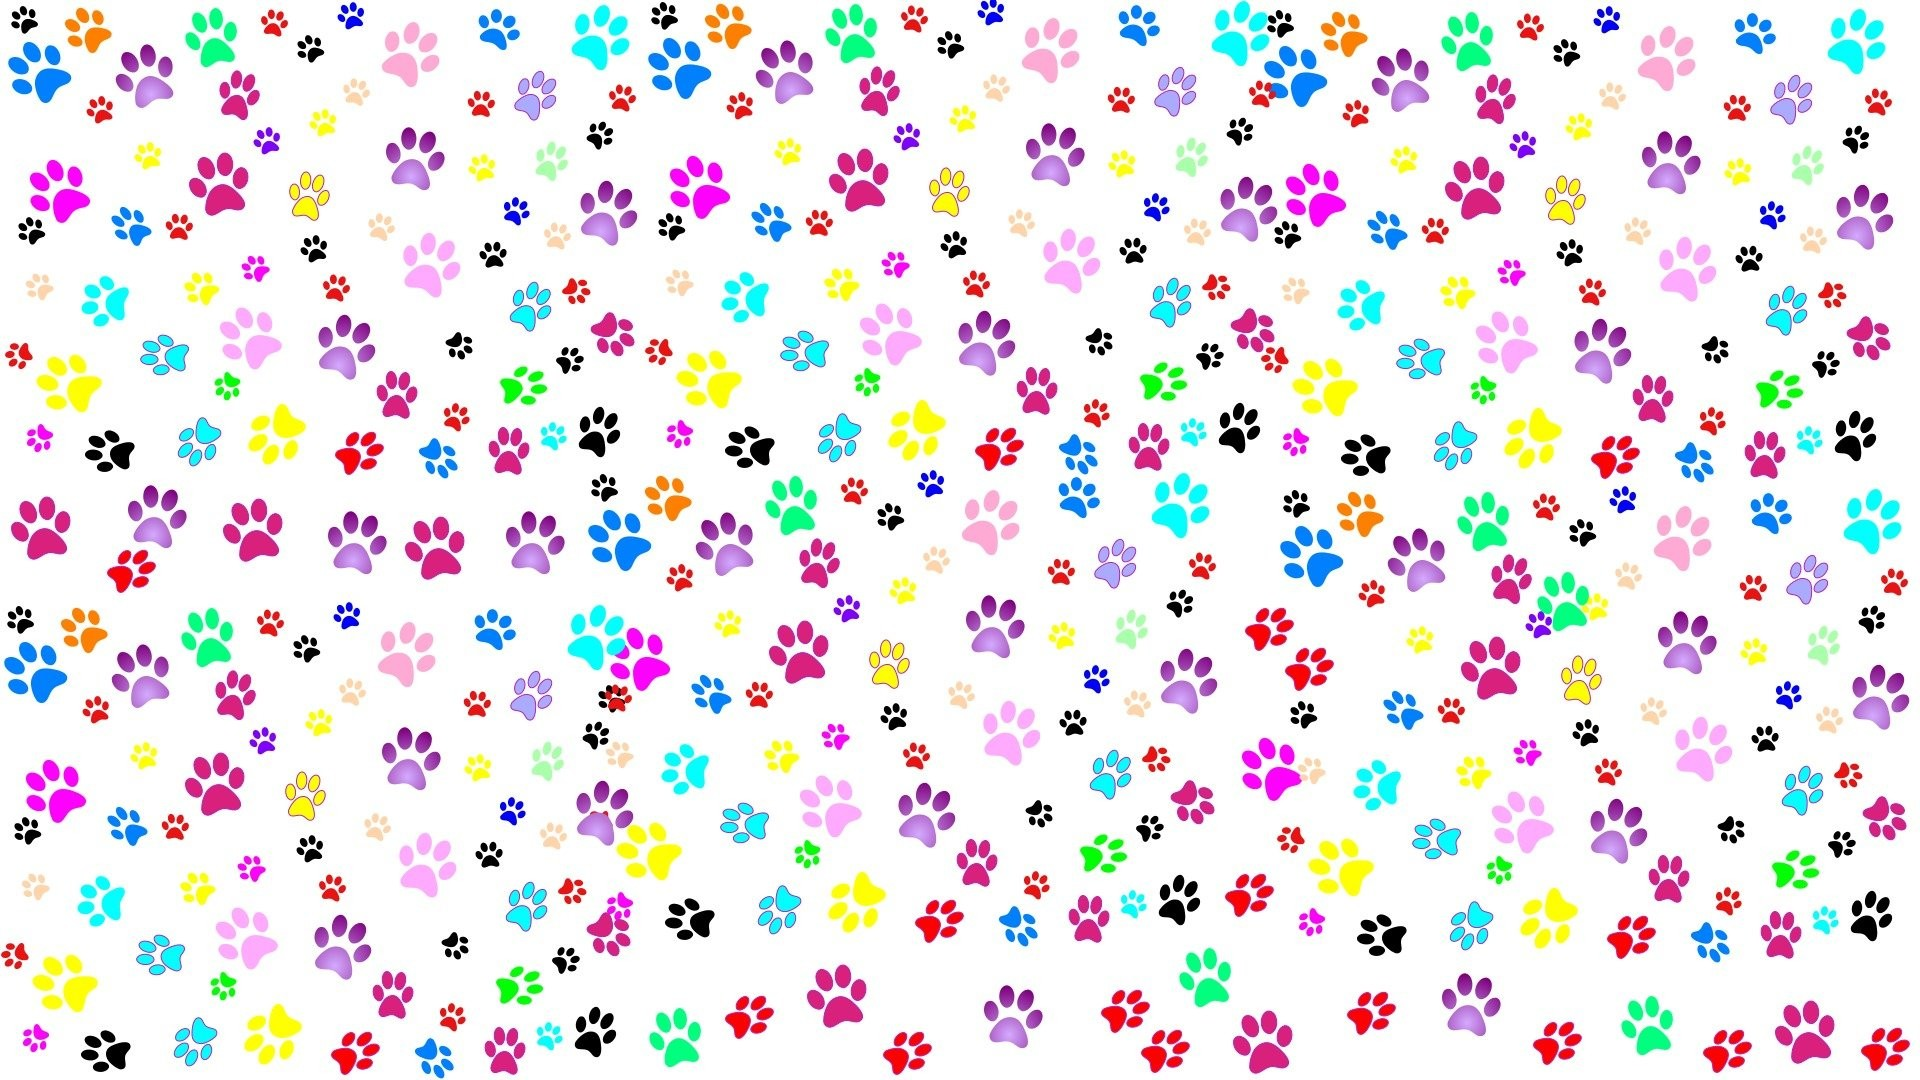 Paw Print Wallpaper (34+ images)